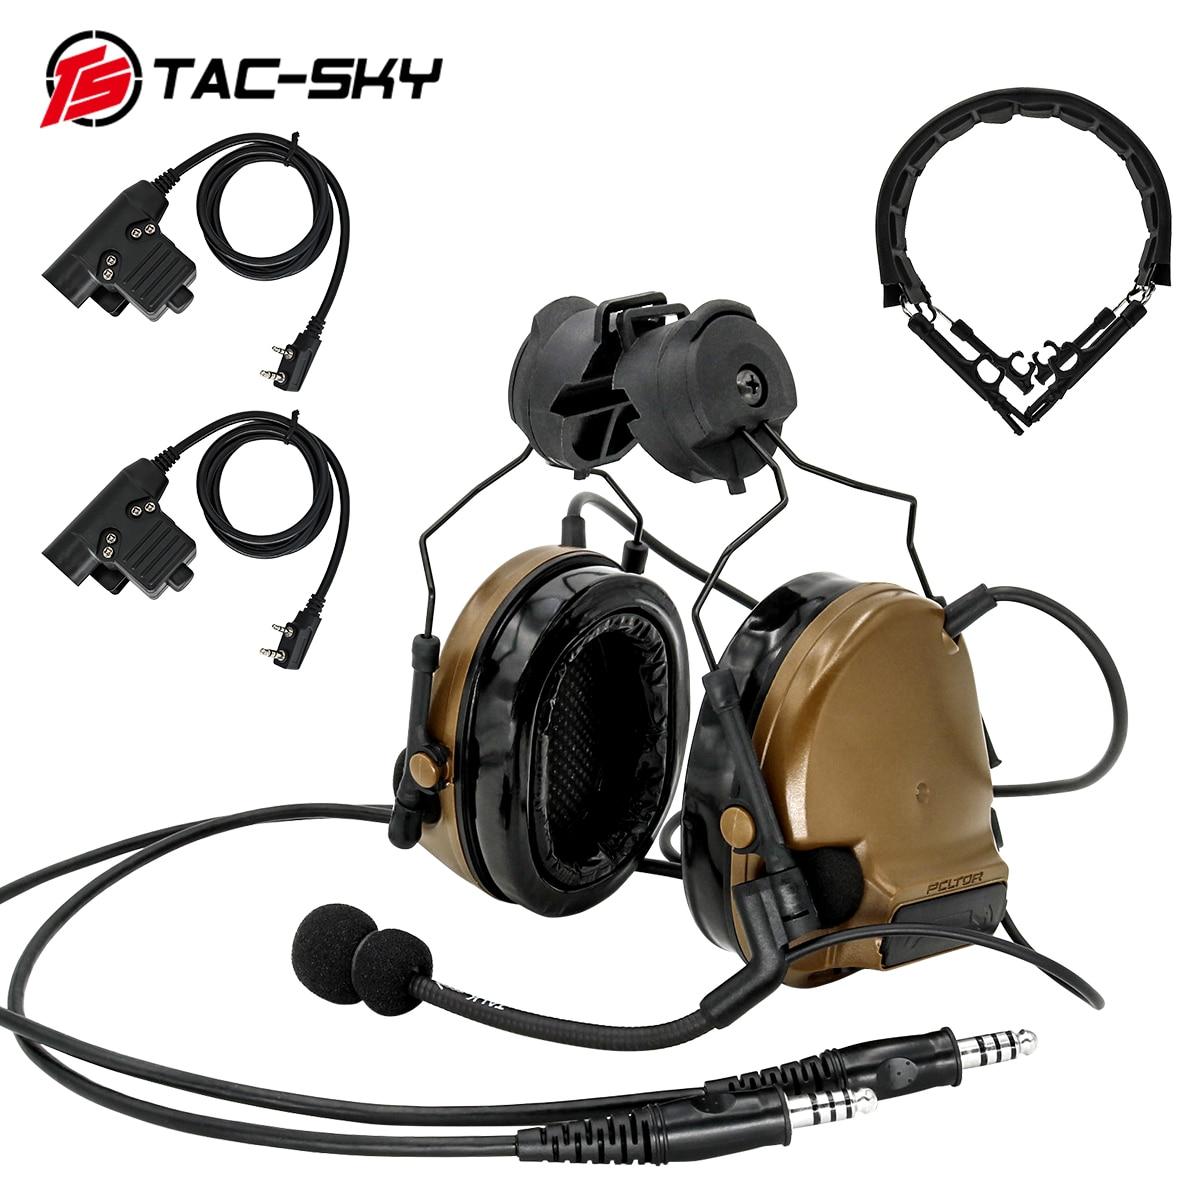 TAC-SKY COMTAC III المزدوج الاتصالات سيليكون غطاء للأذنين التكتيكية سماعة CB/التكتيكية سماعة استبدال عقال/PTT U94PTT